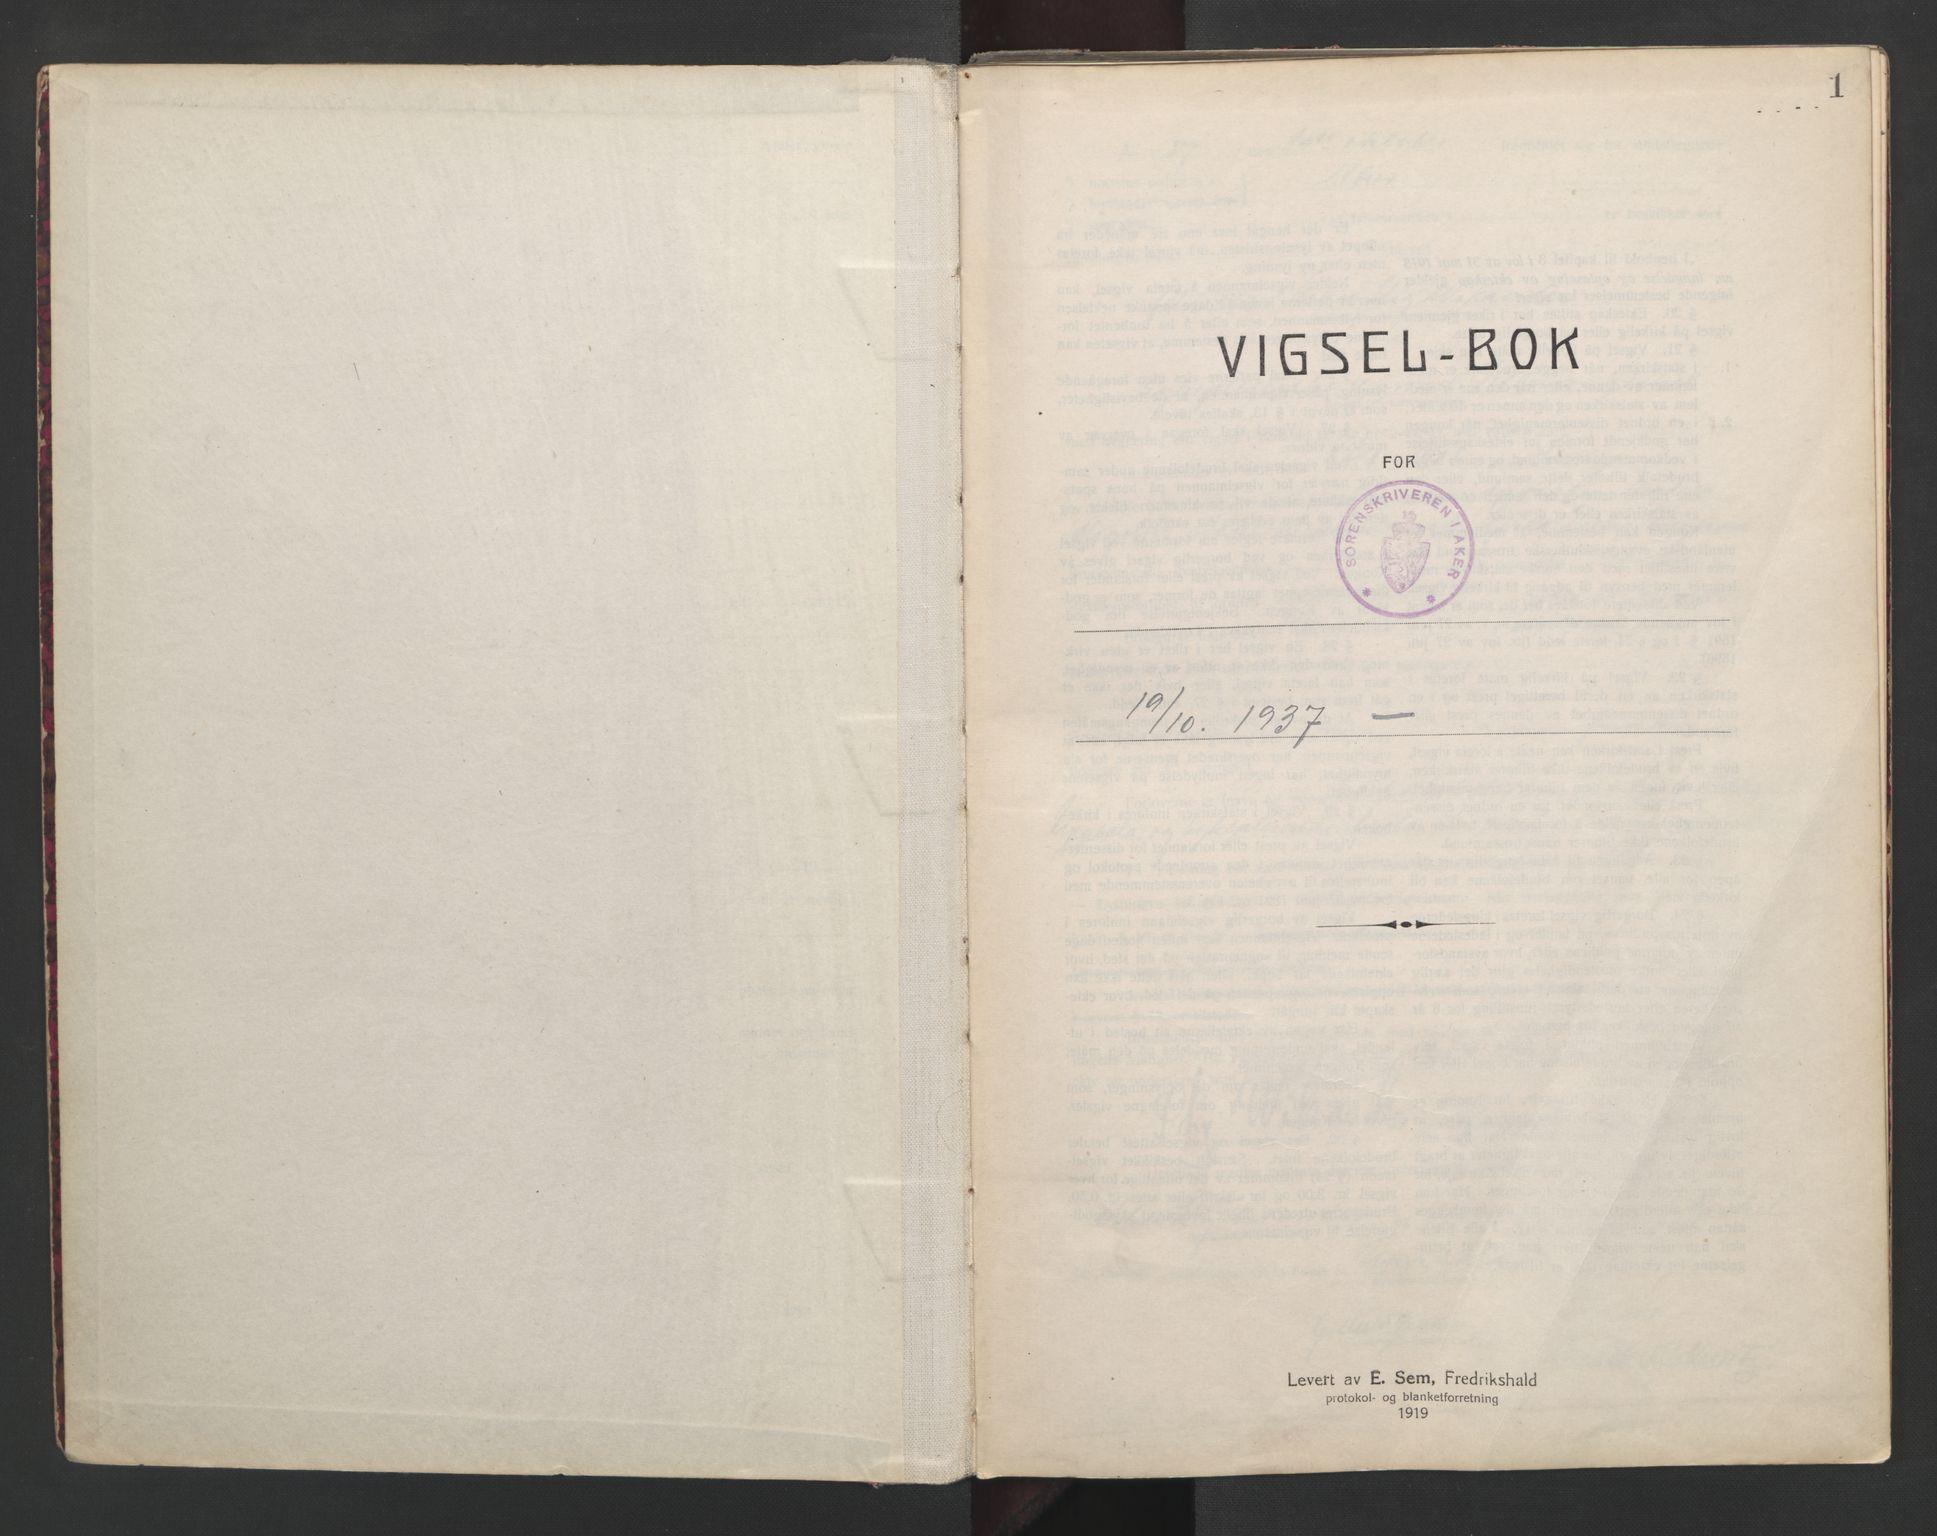 SAO, Aker sorenskriveri, L/Lc/Lcb/L0010: Vigselprotokoll, 1937-1938, s. 1